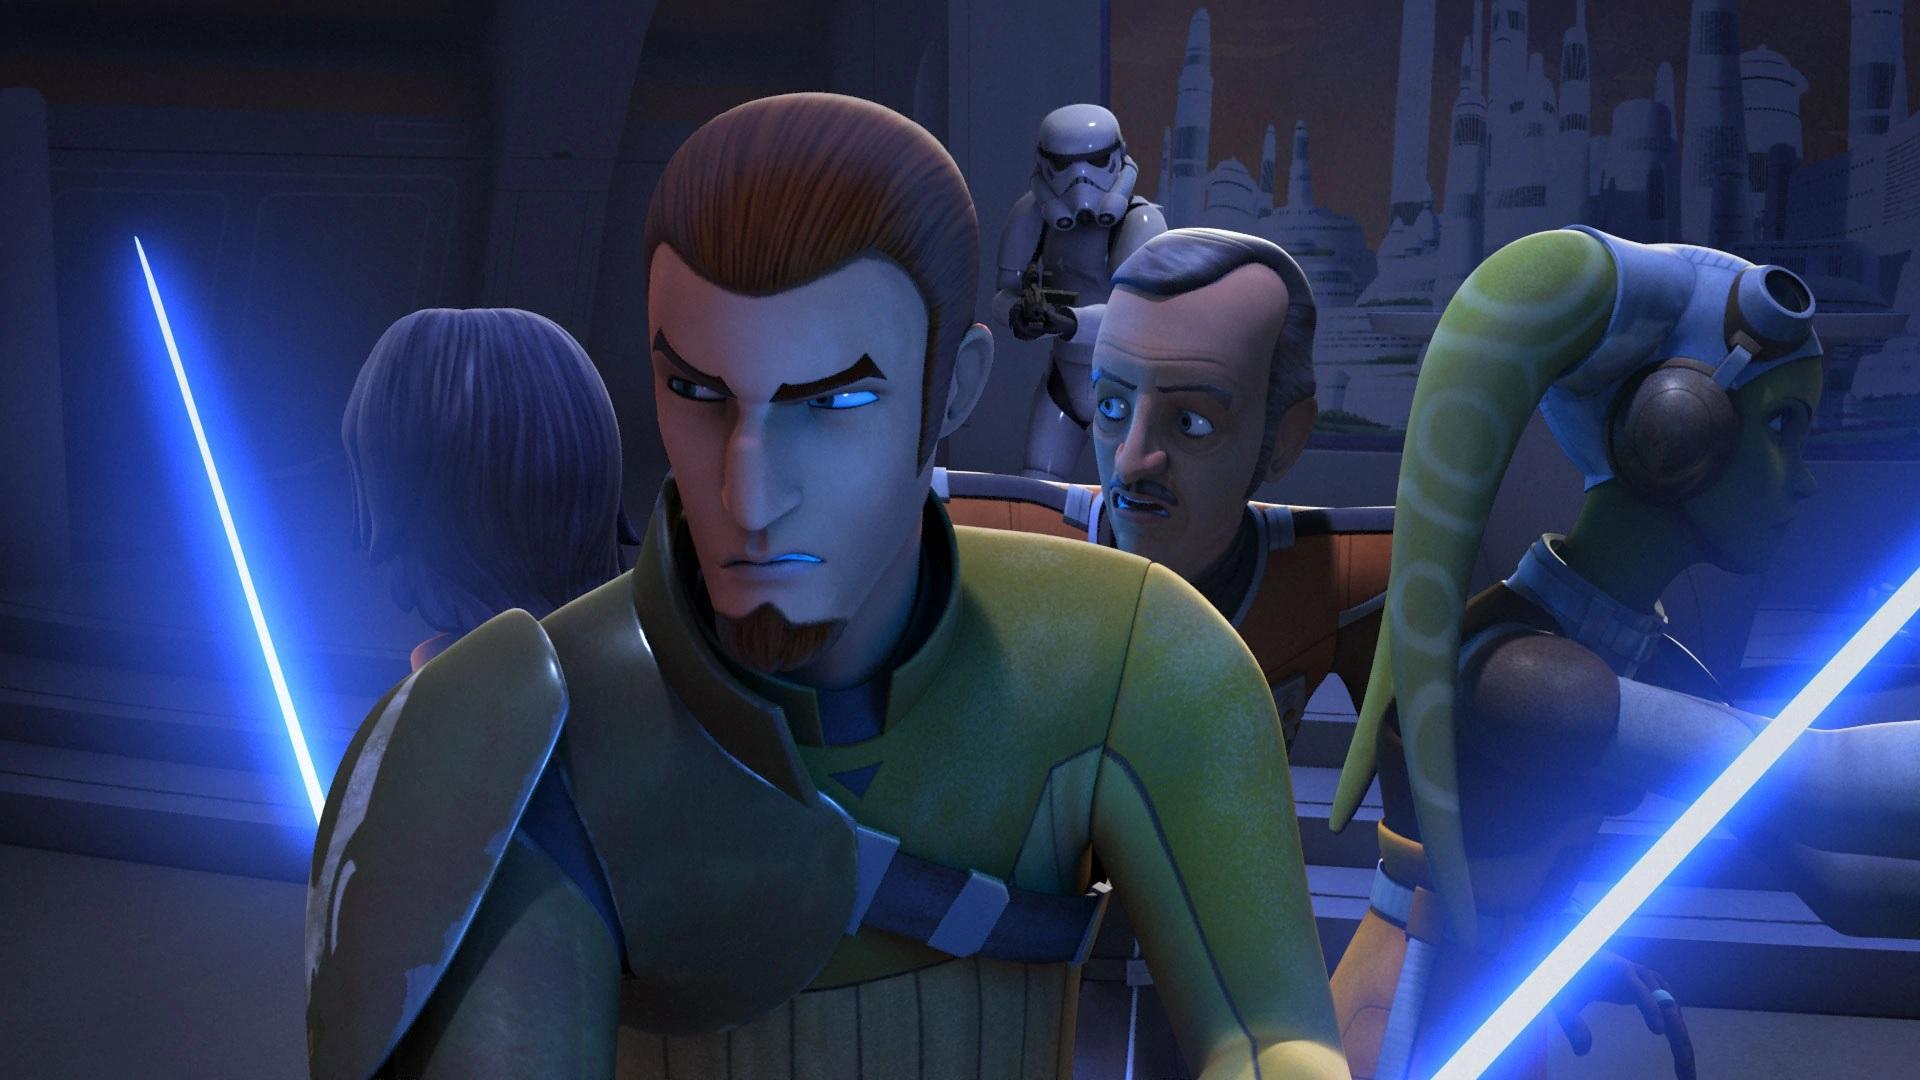 Star Wars: Rebelii Sezonul 1 Episodul 11 Online Subtitrat